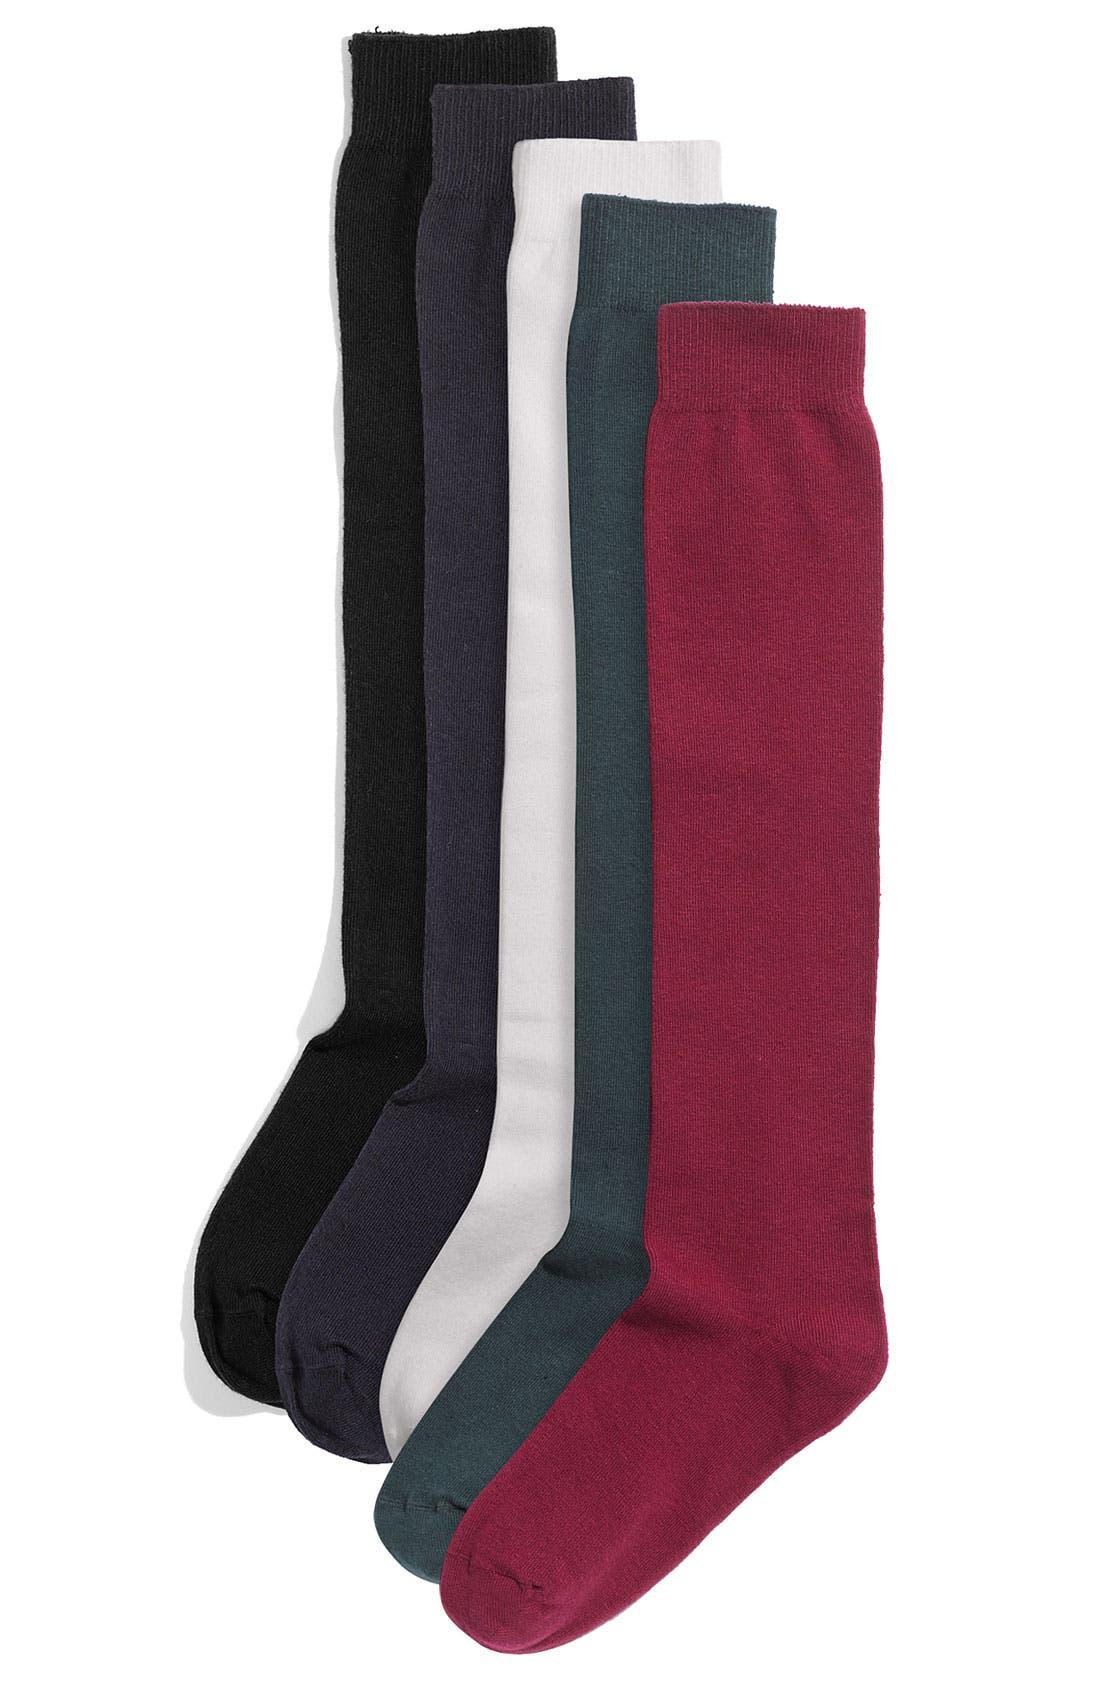 Flat Knit Knee Socks,                         Main,                         color, 088